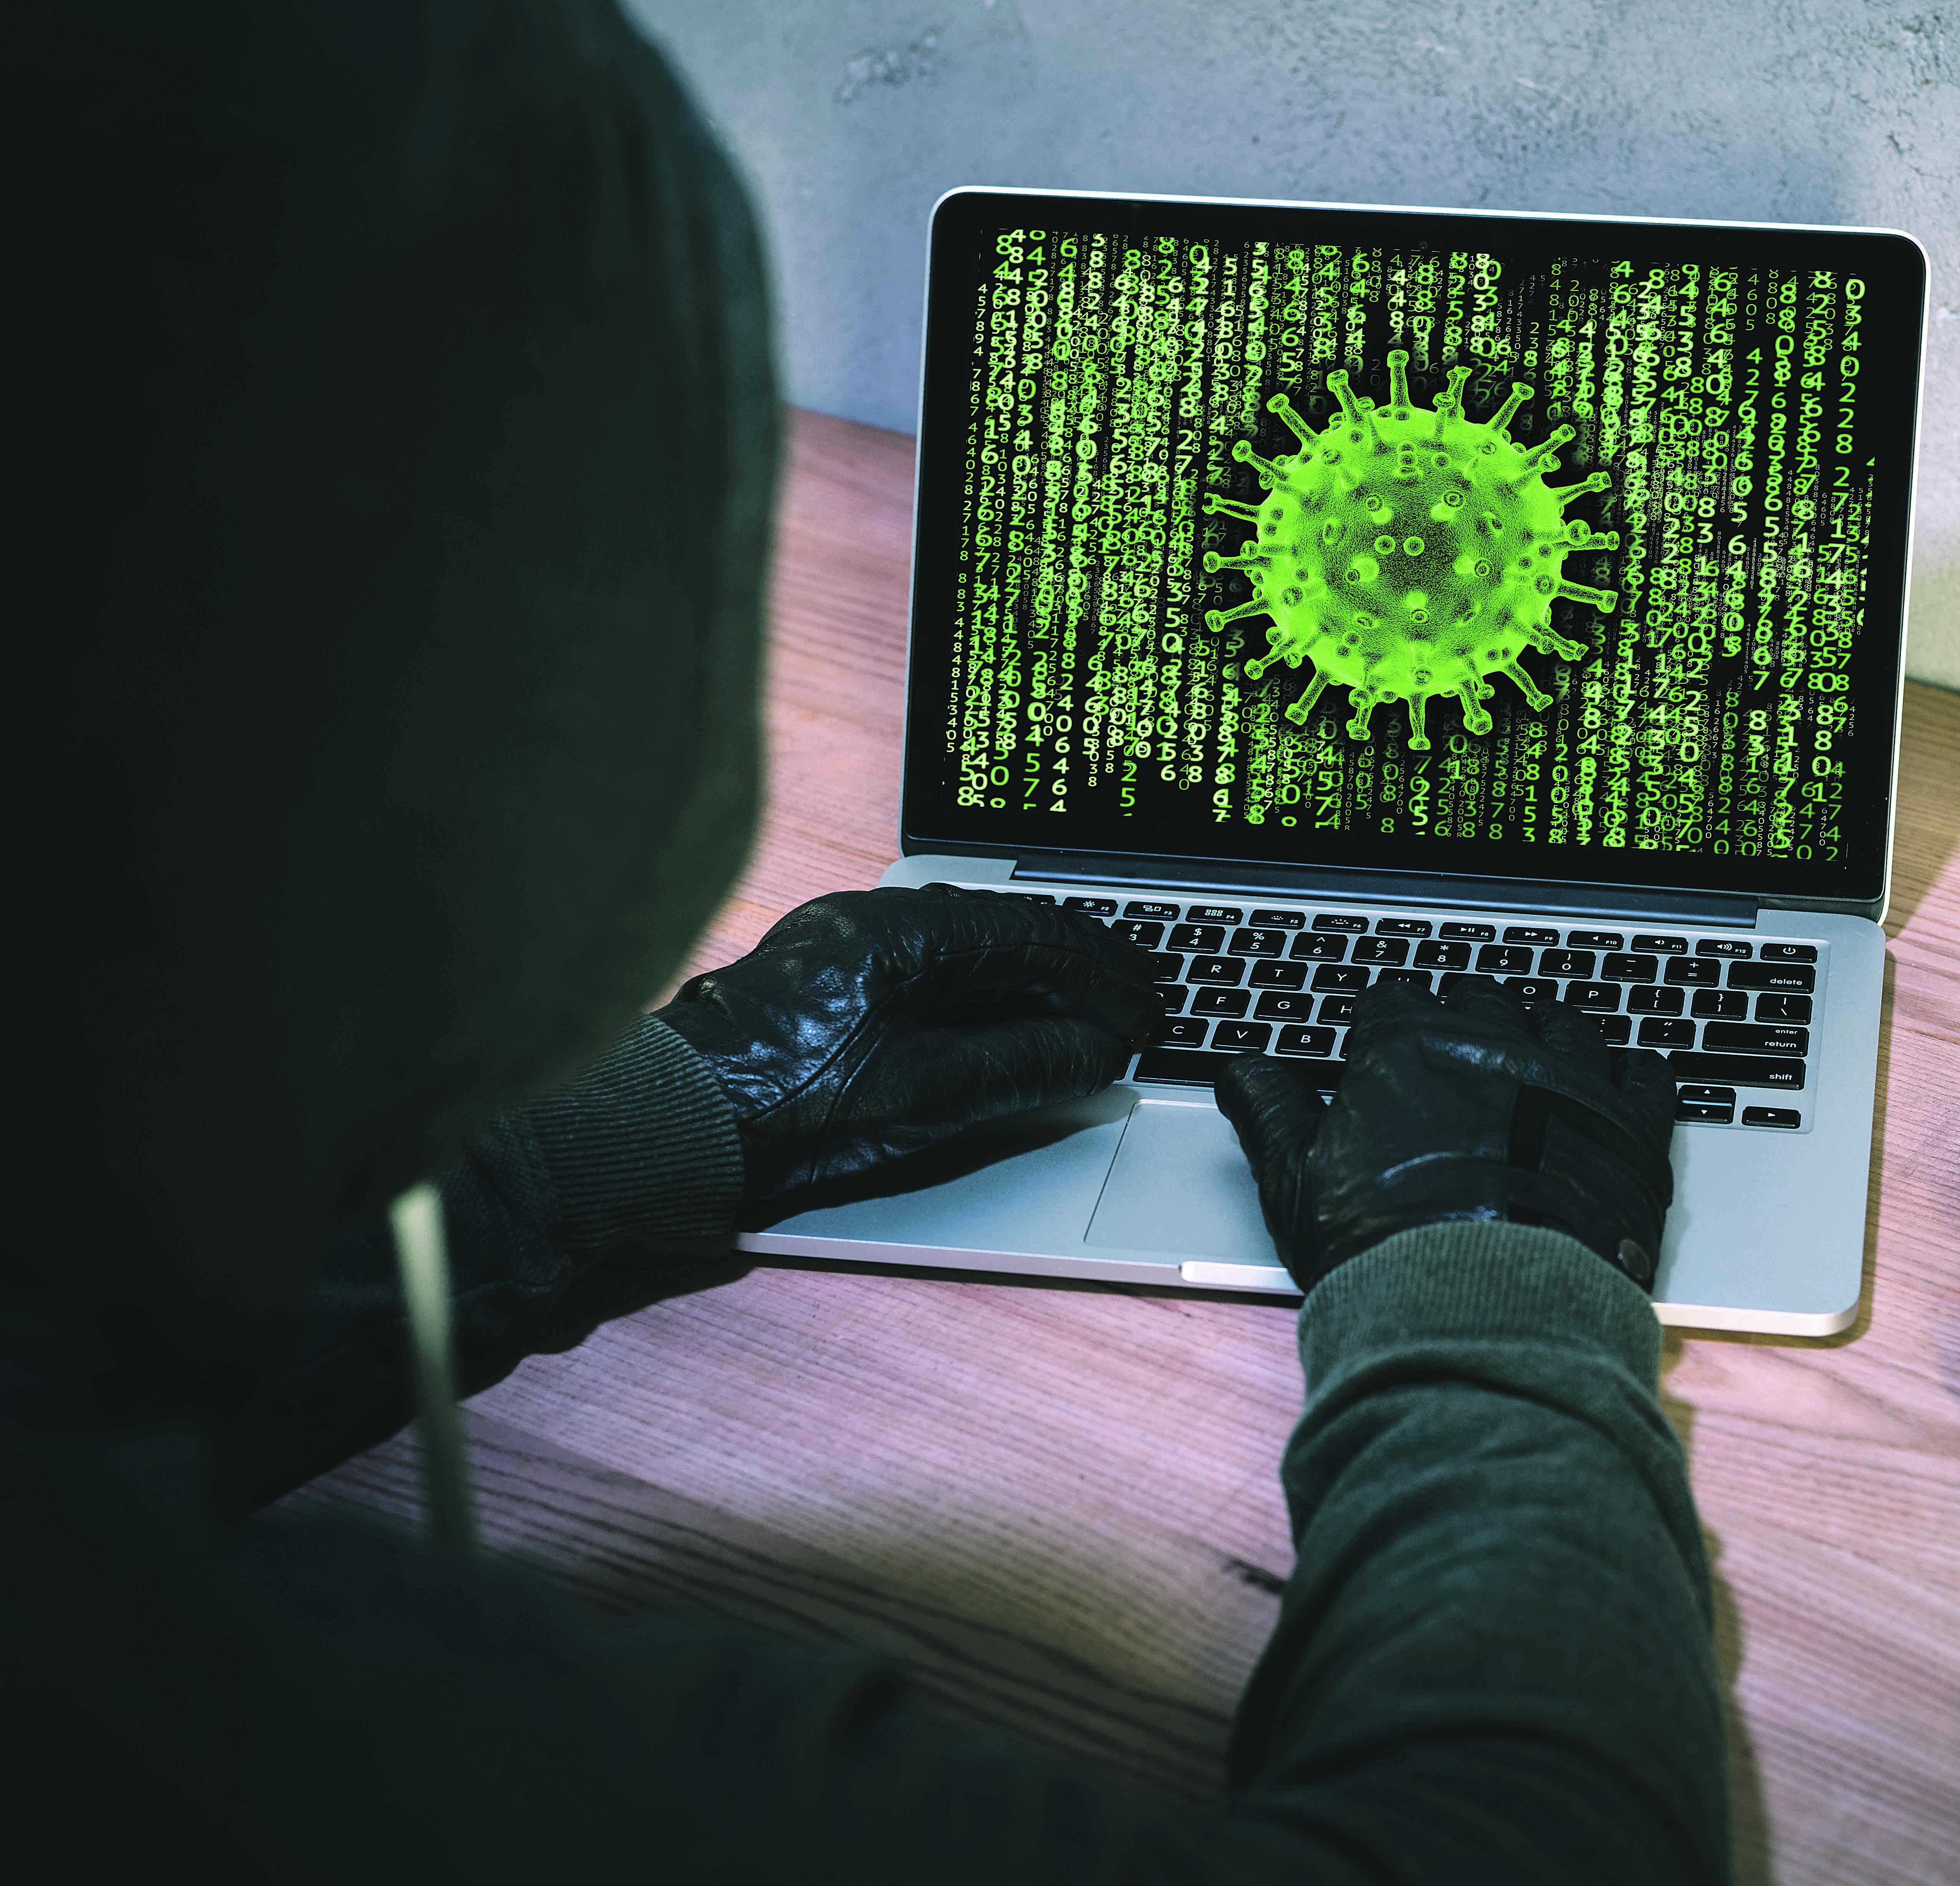 Pandemia de golpes na internet